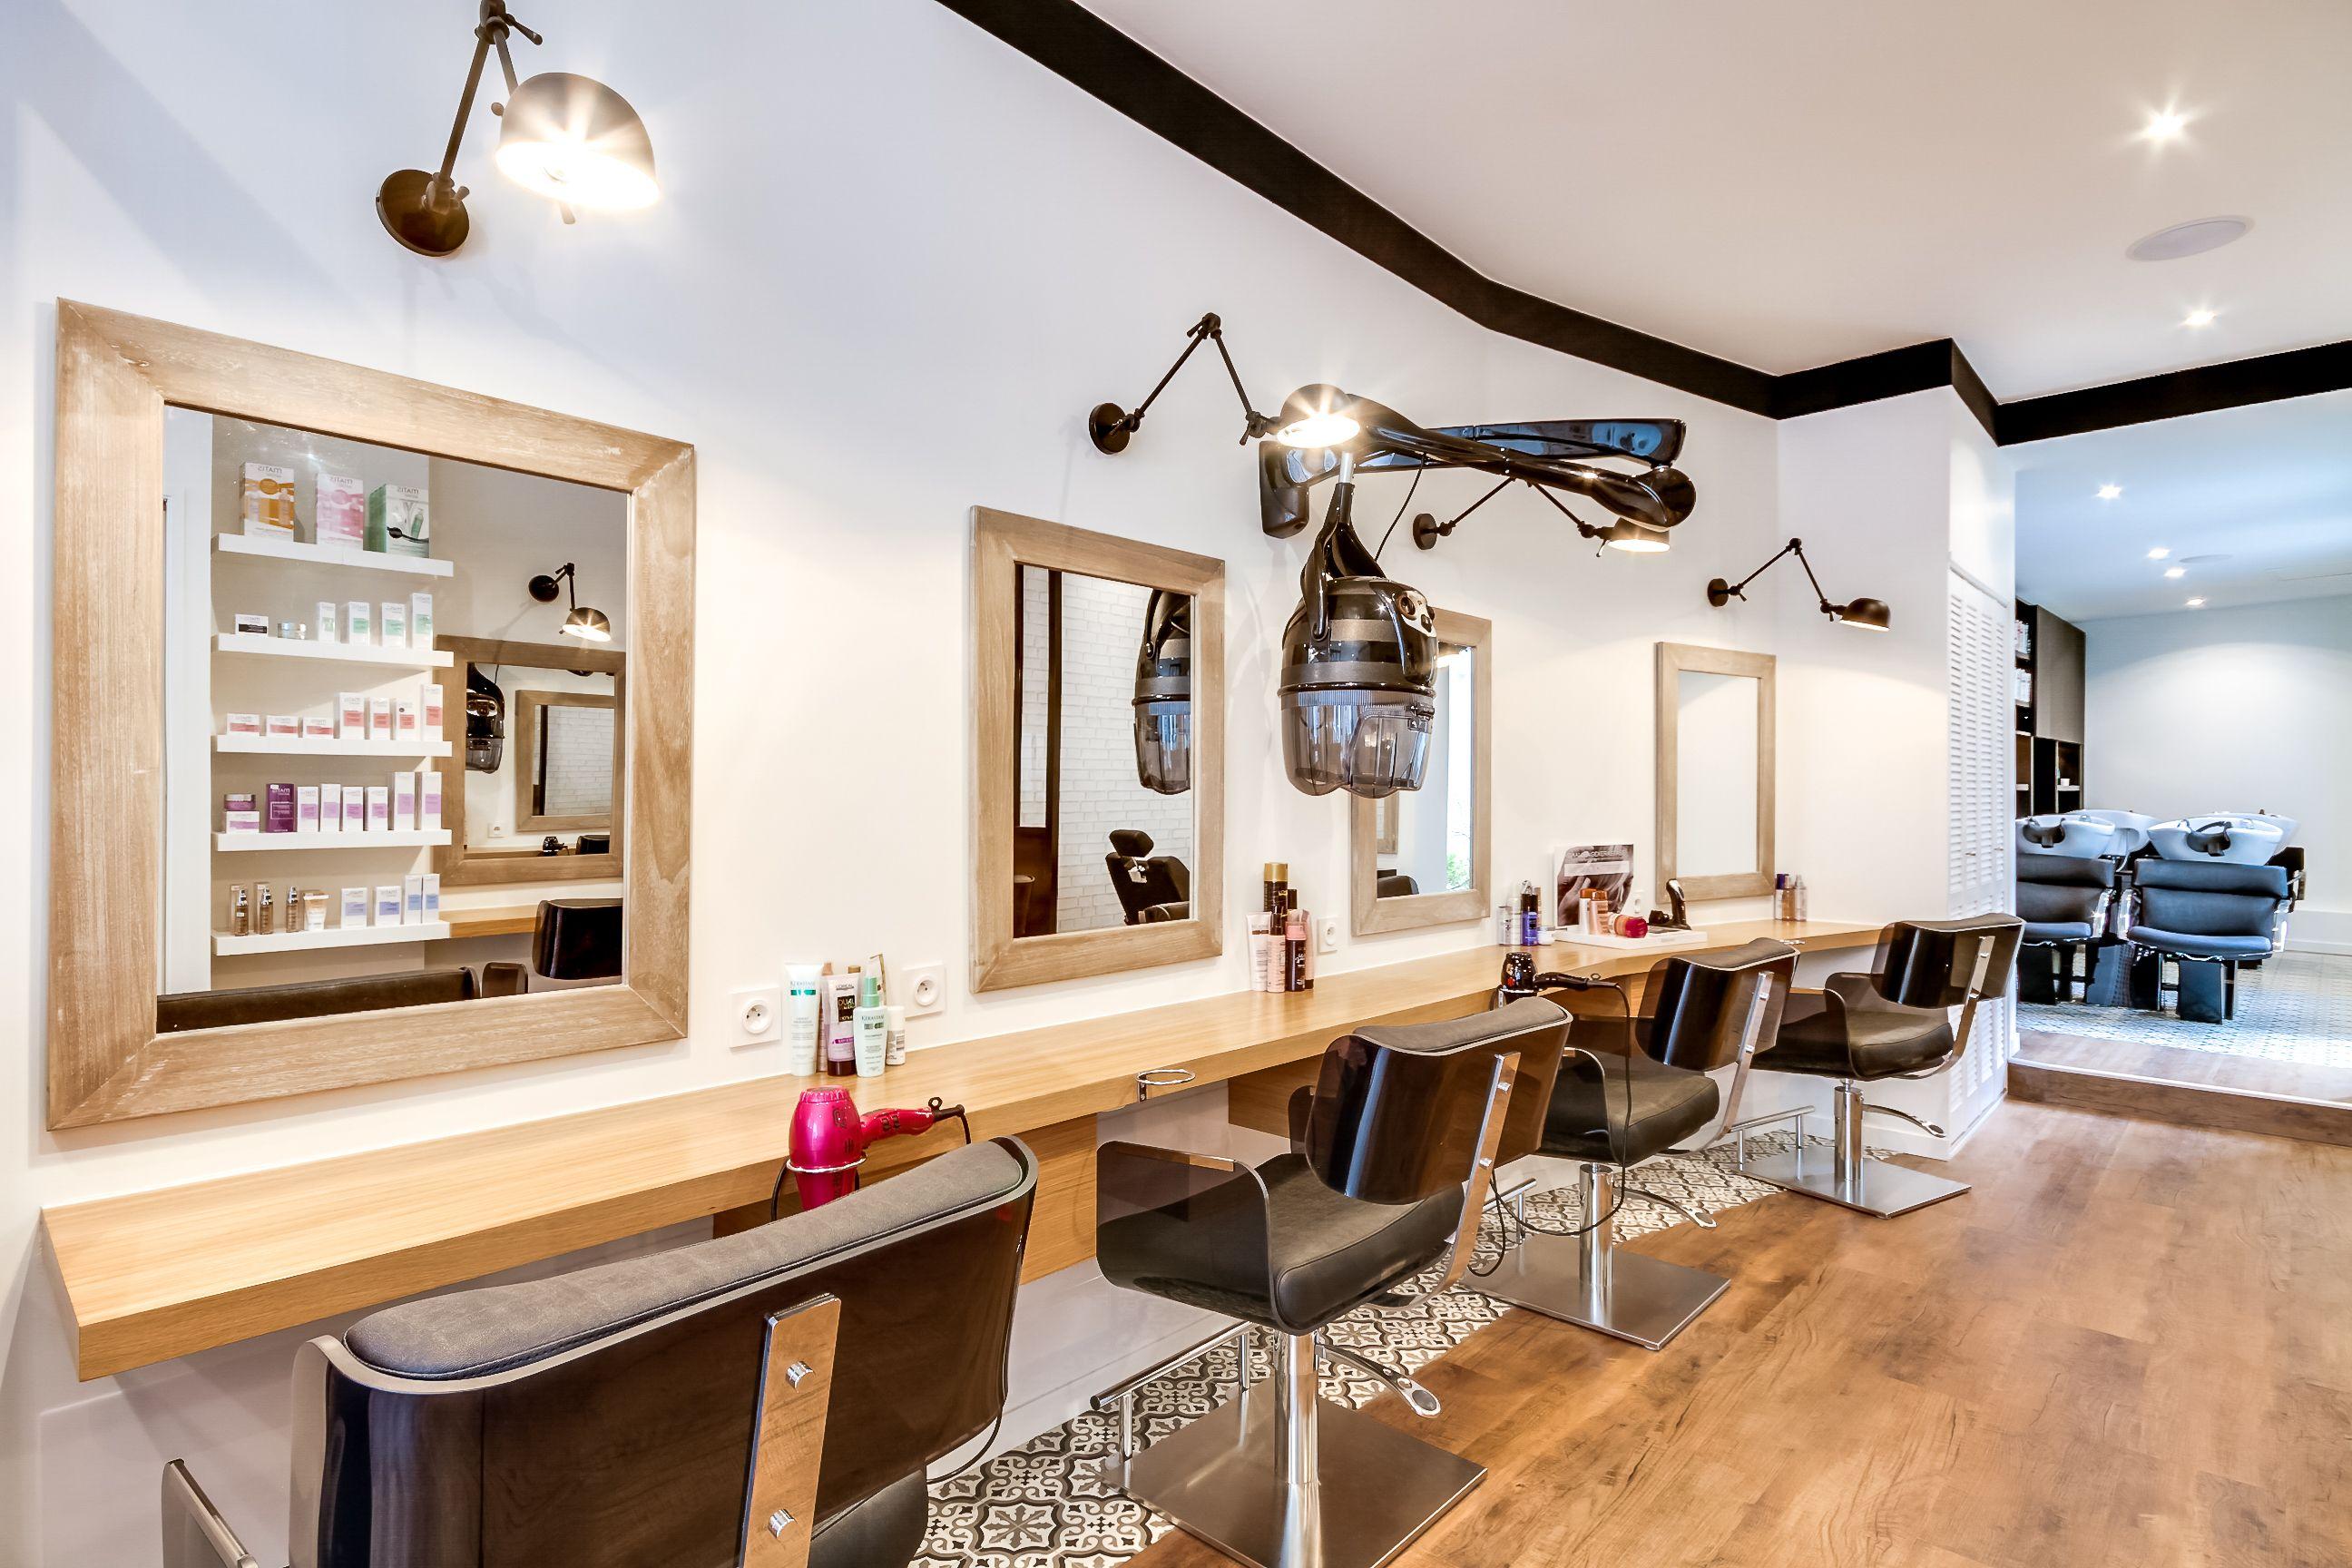 af16c771c396d18620465a3825e2446b Frais De Bar De Salon Ikea Concept